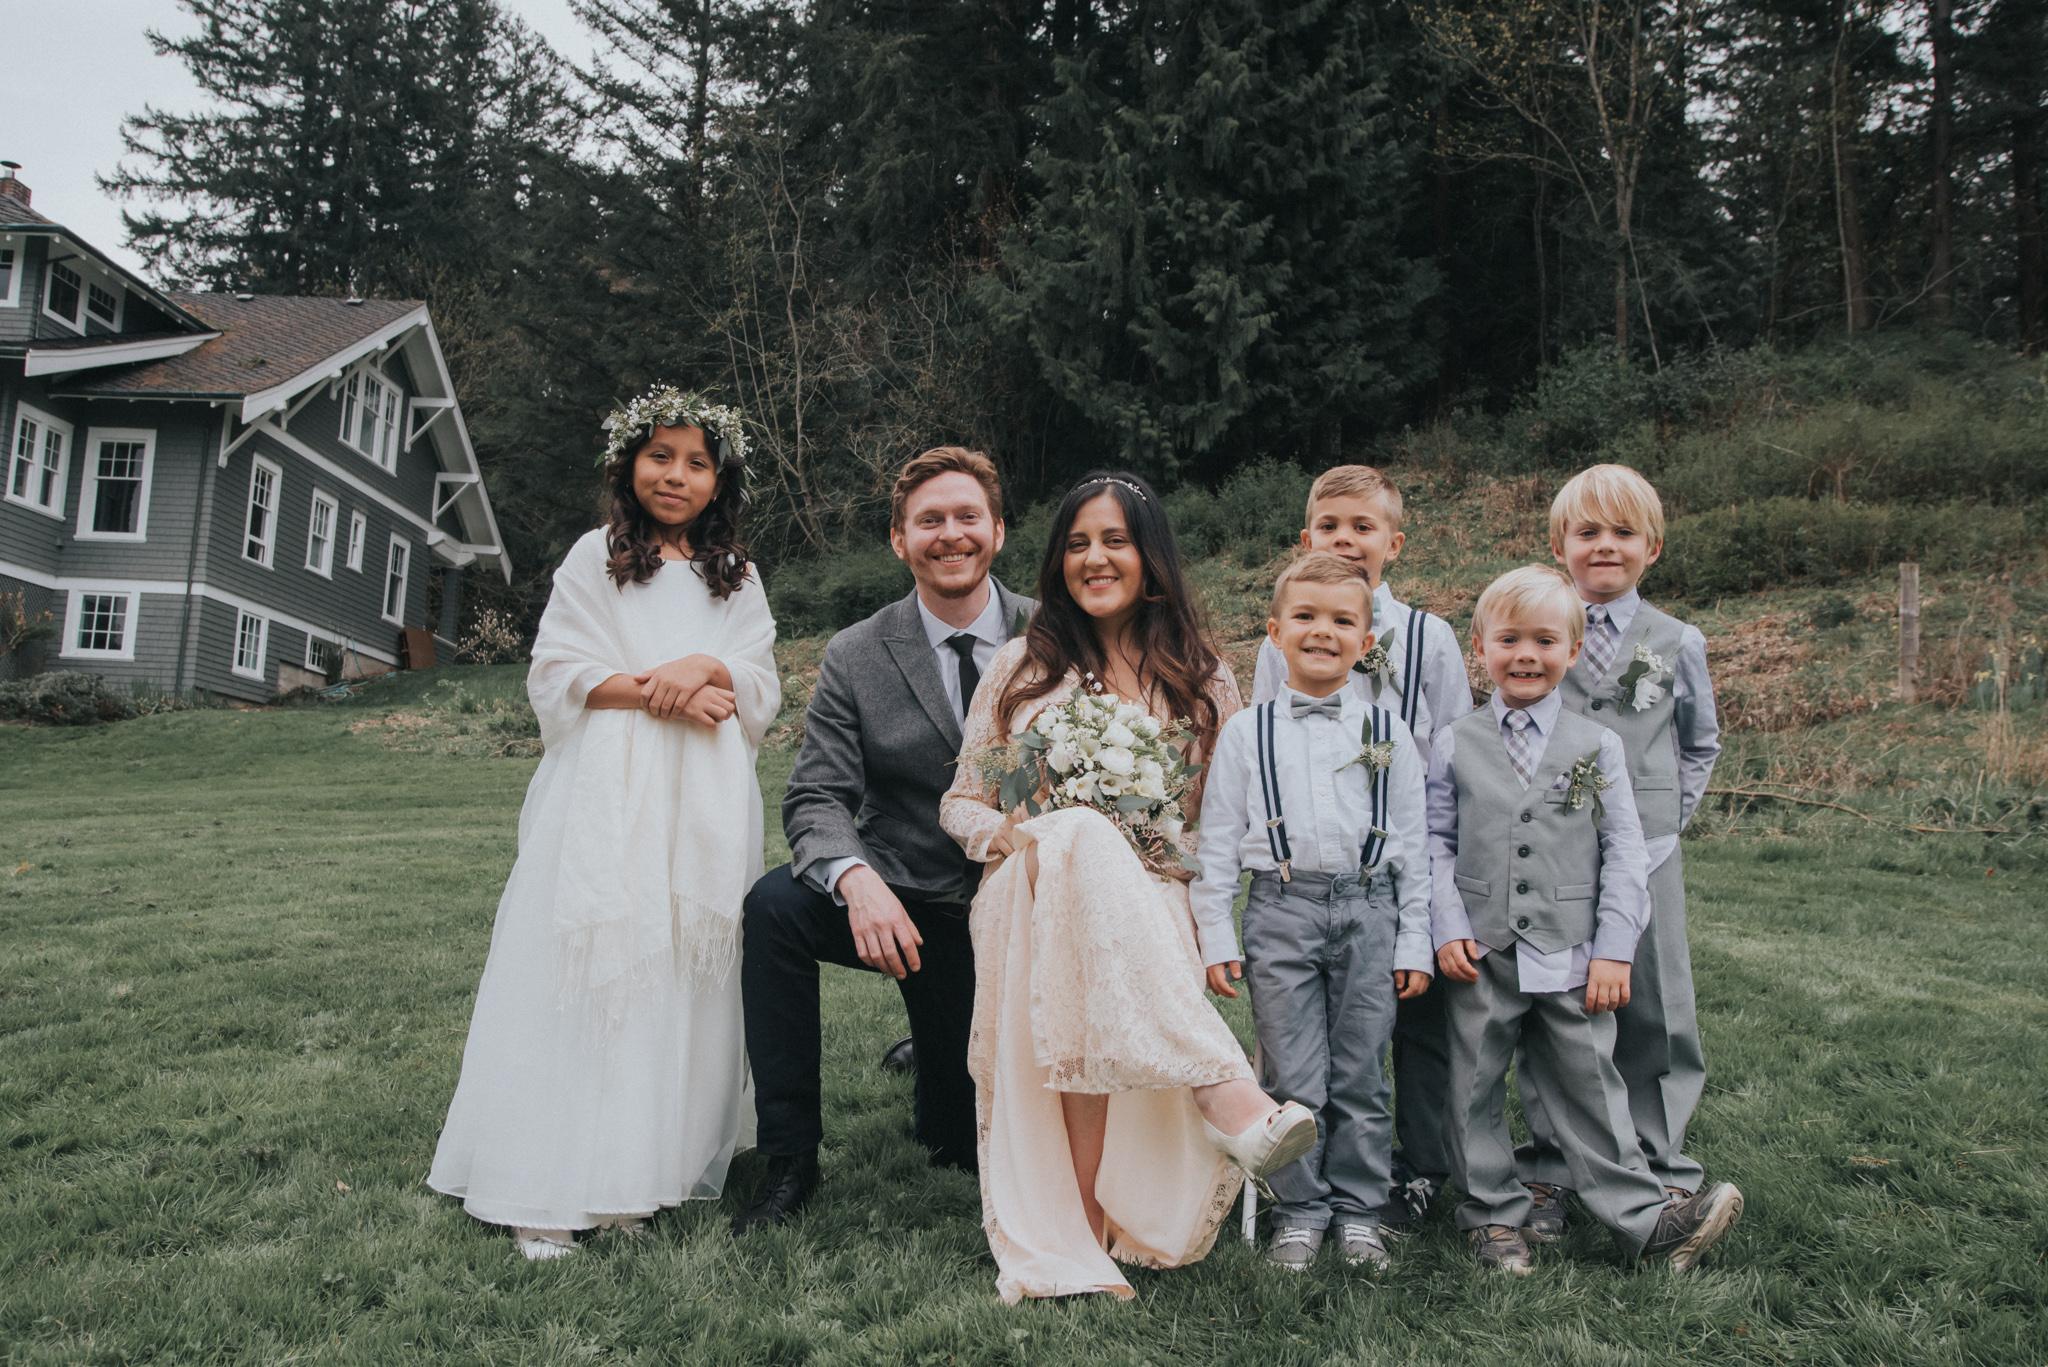 Bellingham wedding Woodstock Farms Vishal Goklani Seattle Wedding Photographer026.JPG